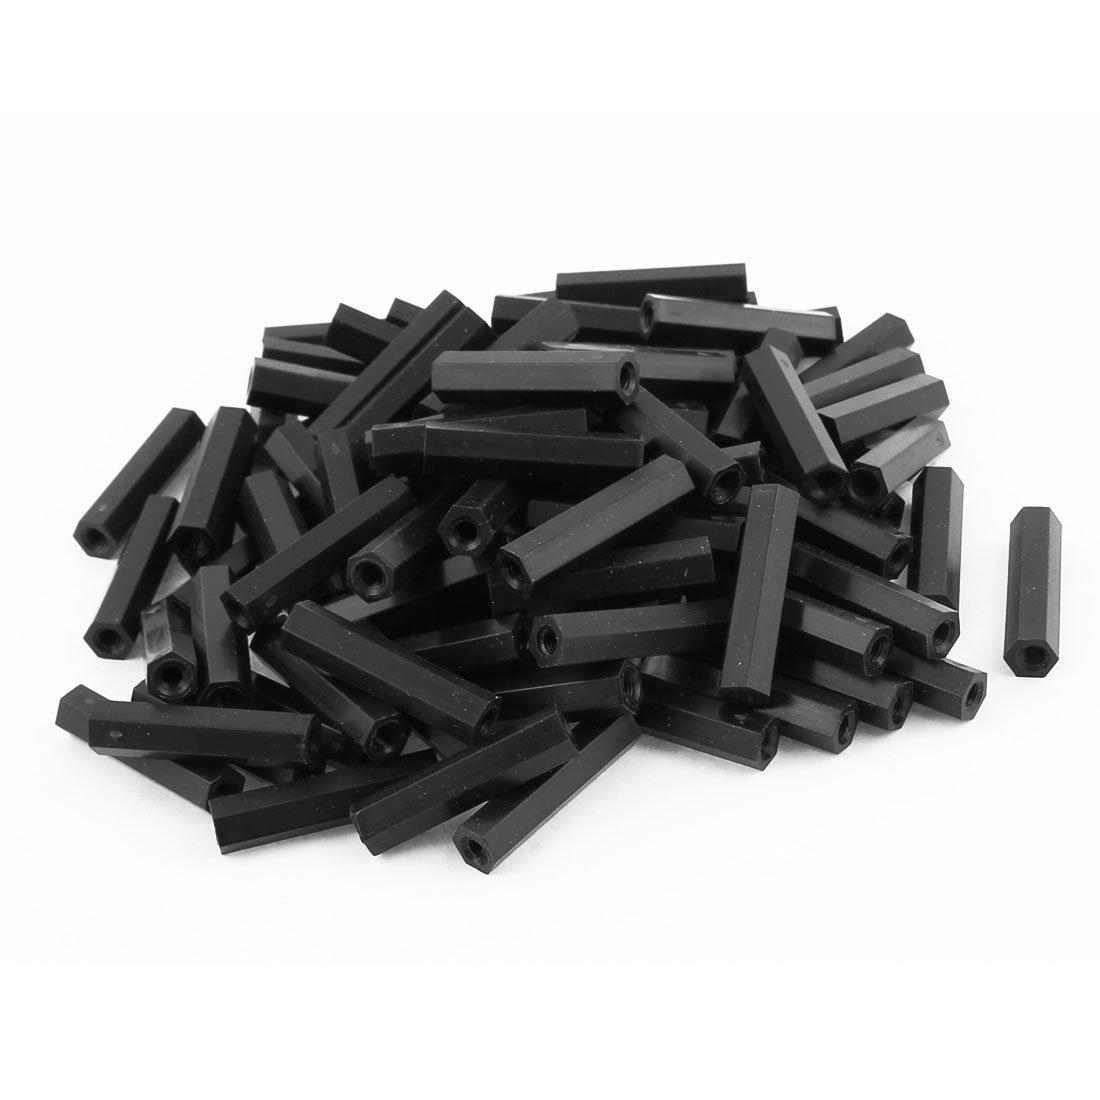 uxcell 100 Pcs M3 x 25mm Black Nylon Hex Hexagonal Threaded Spacer Support